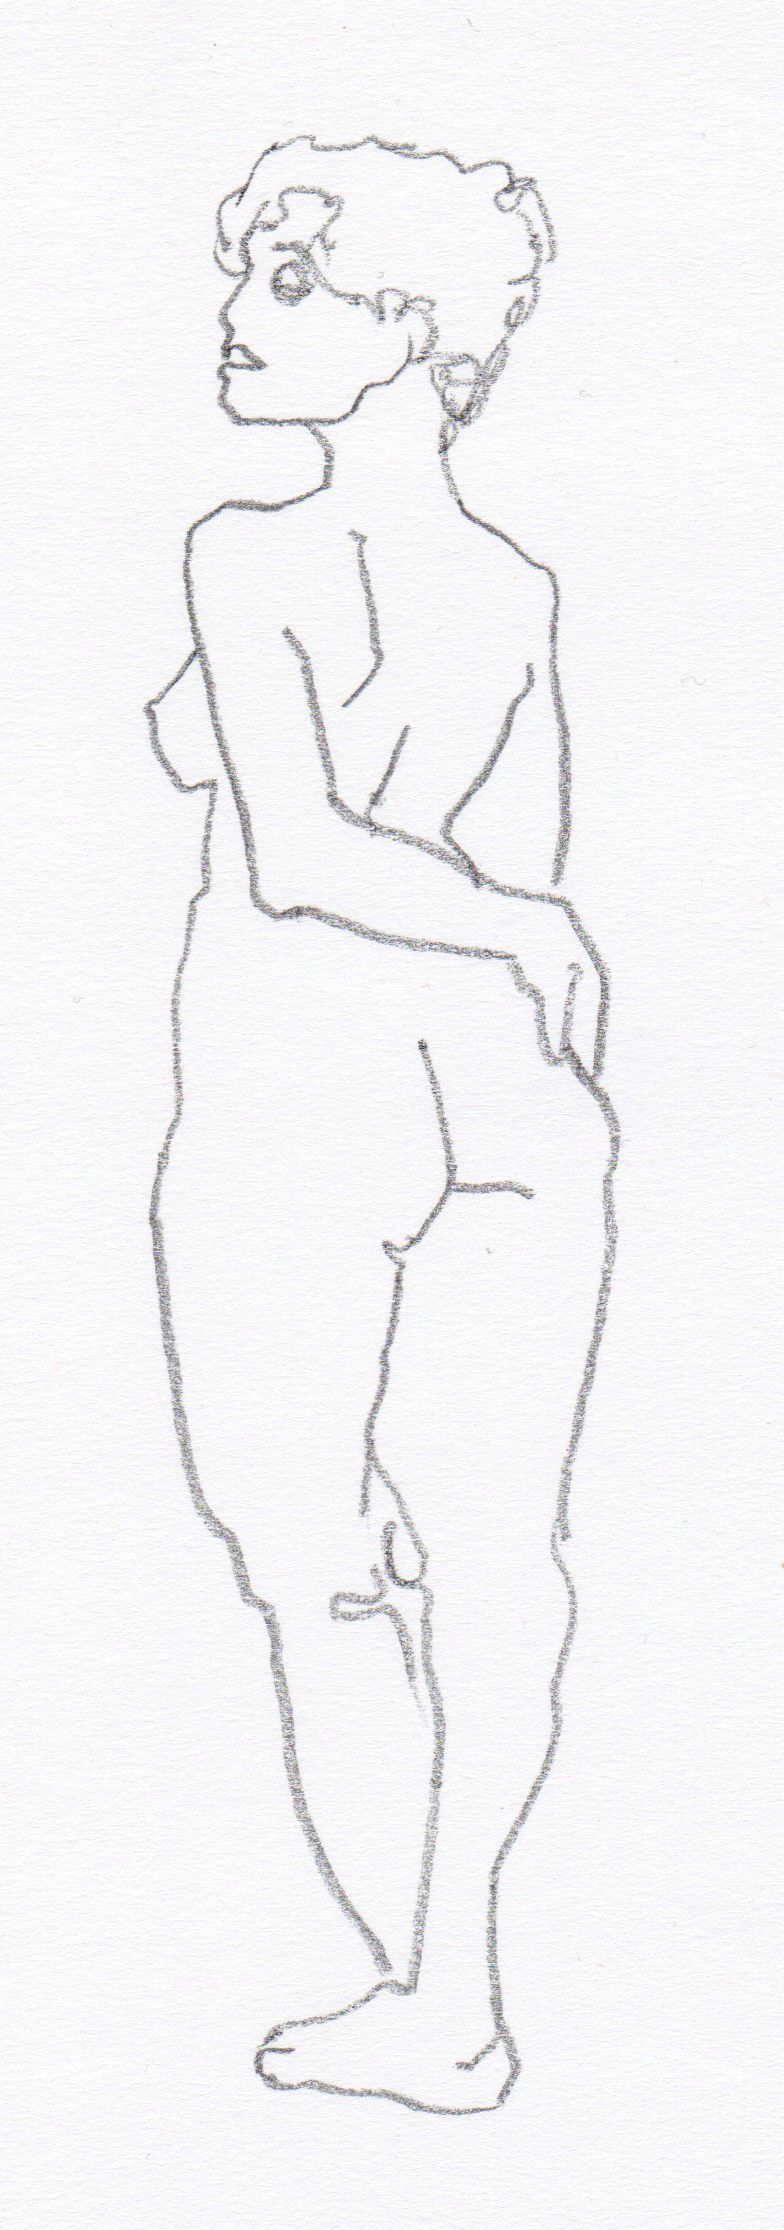 2012_Sketch_F-Beudin_002